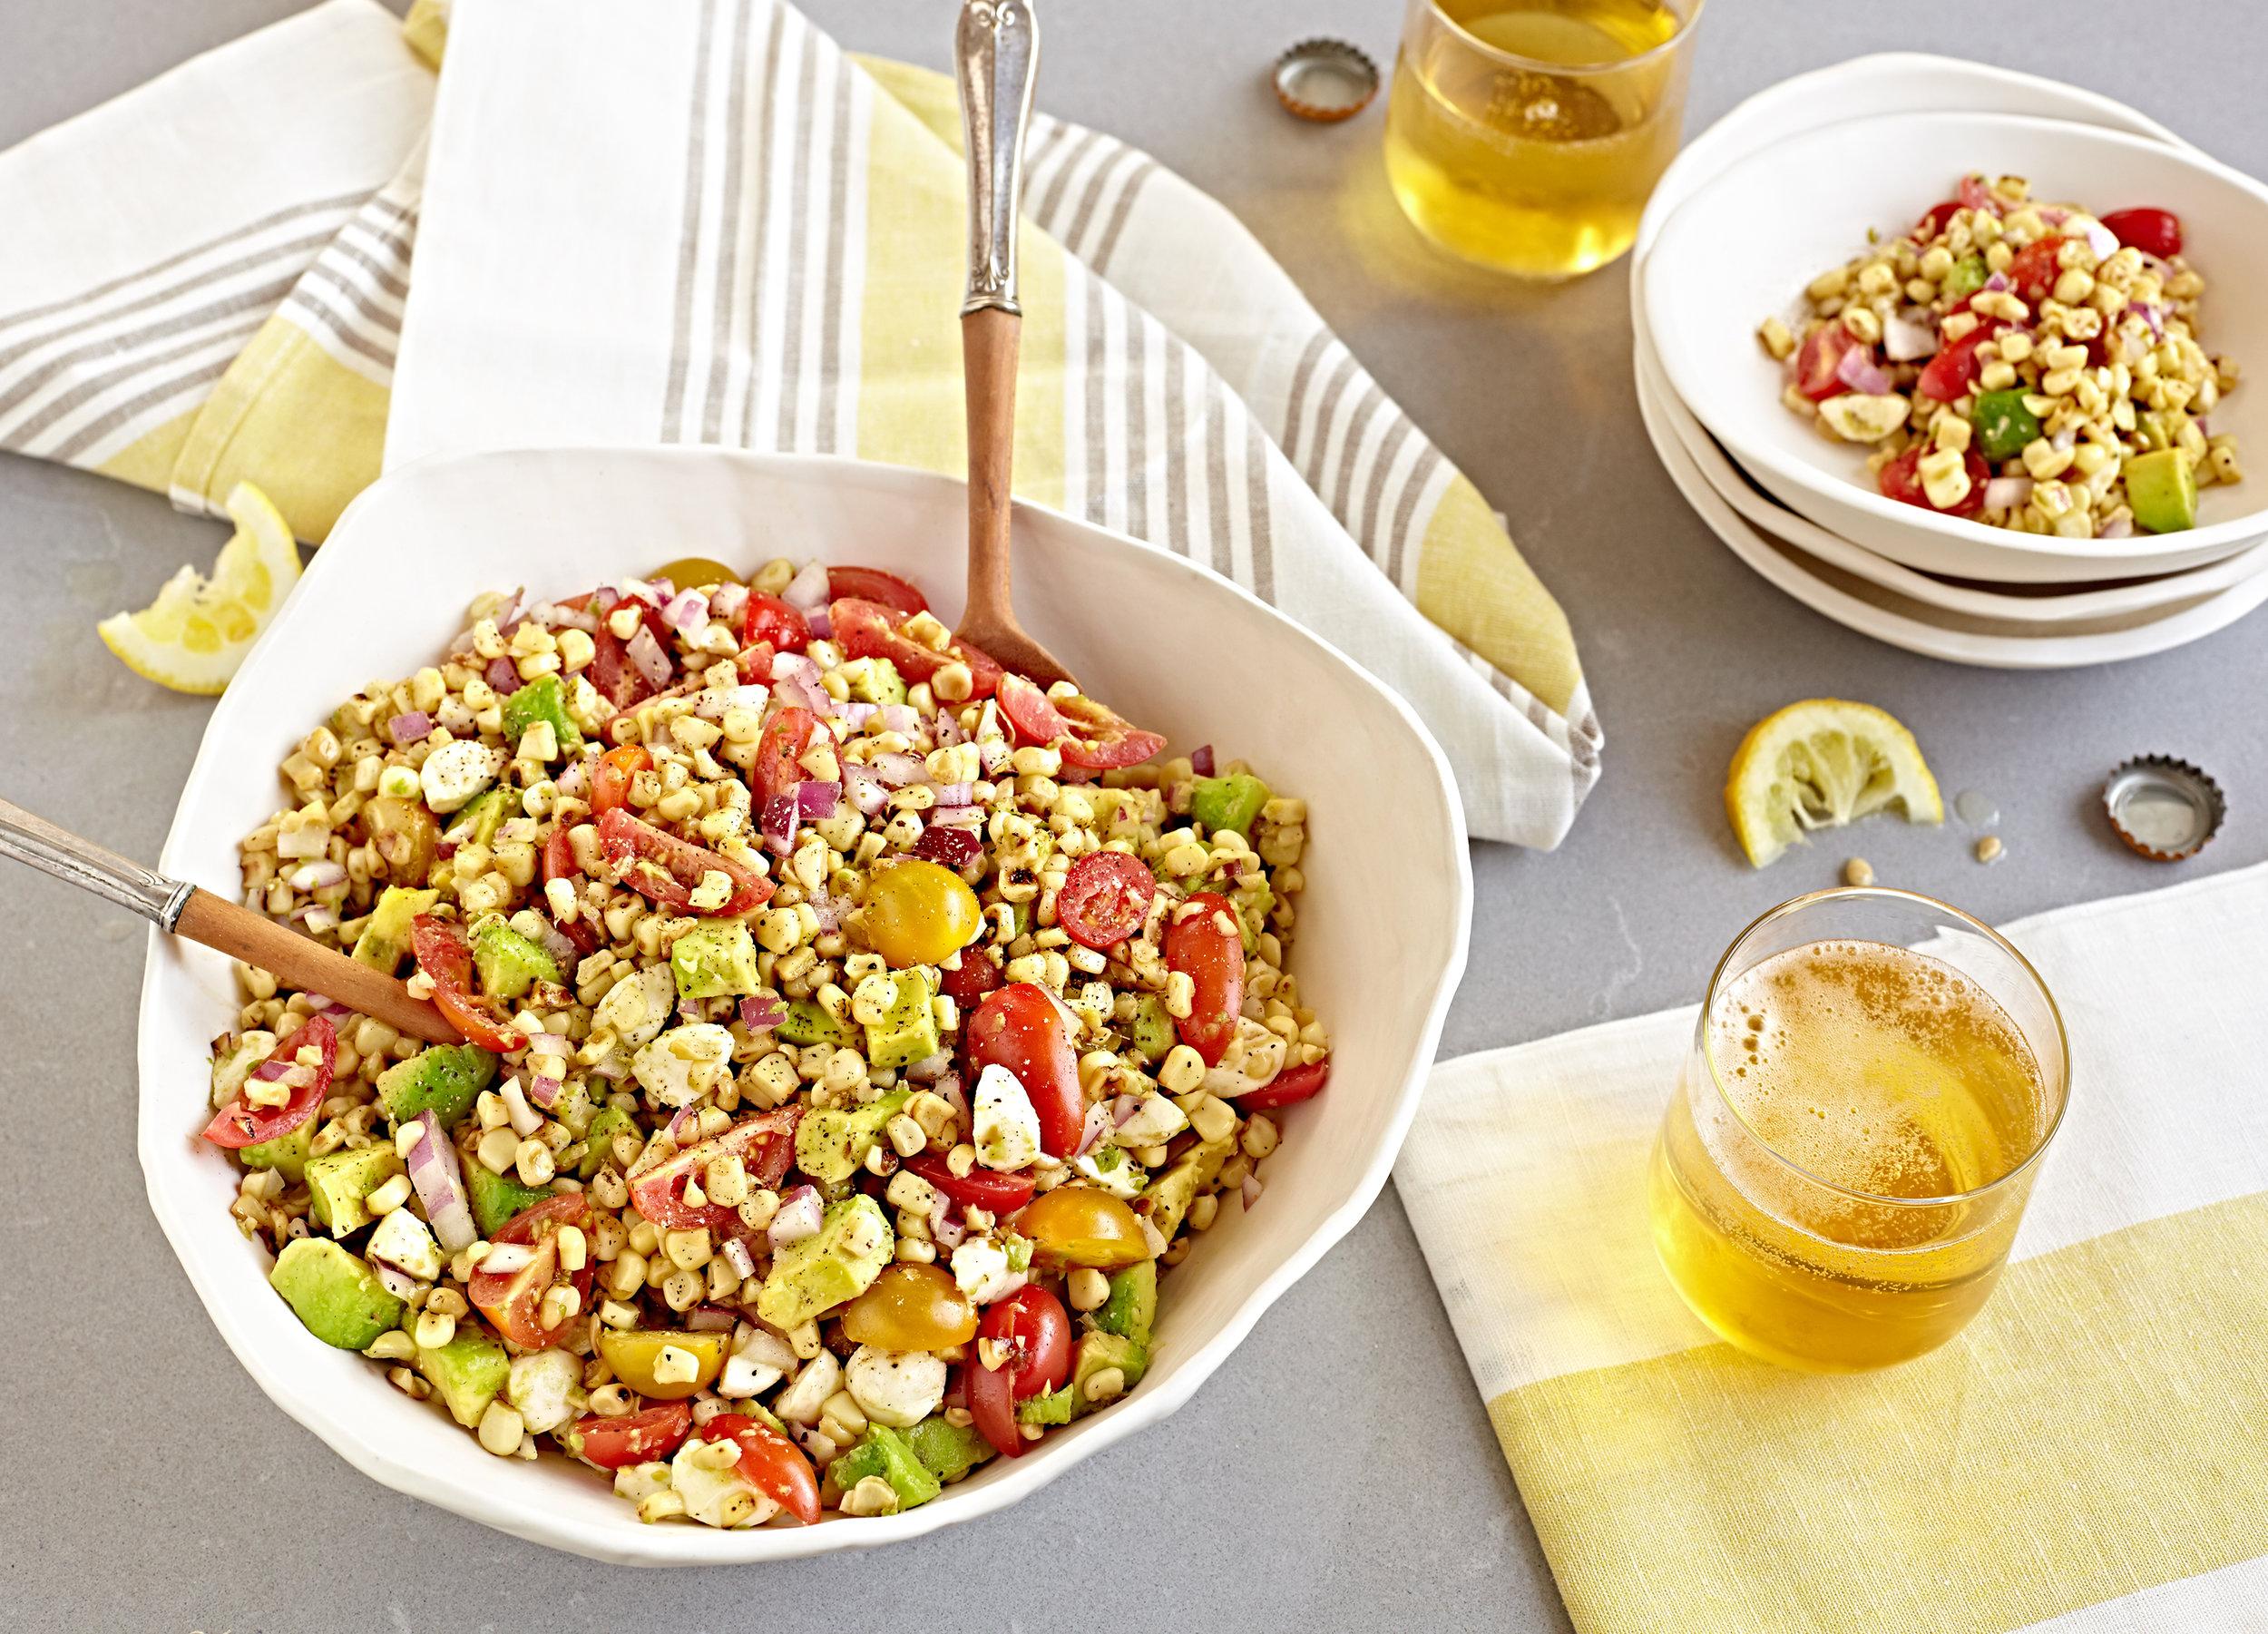 Summer corn salad with fresh avocado tomatoes and mozzarella